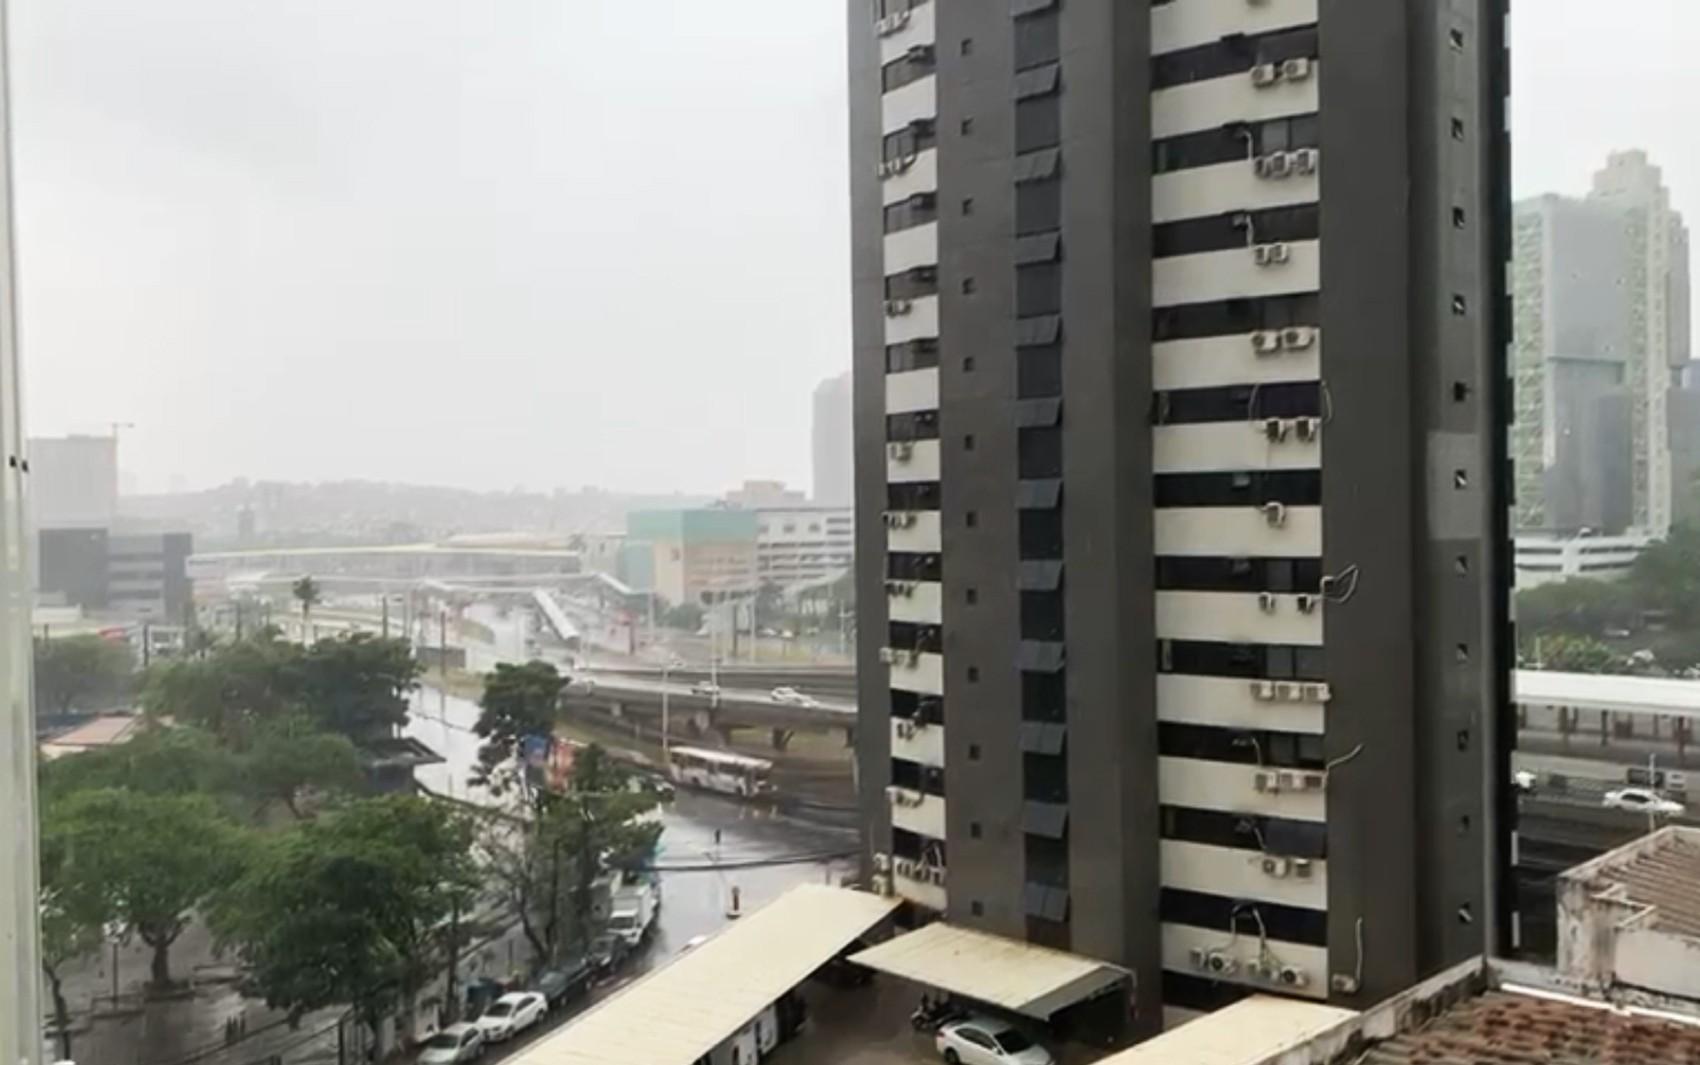 Temporal alaga ruas da cidade de Central, no Norte da Bahia; veja vídeos